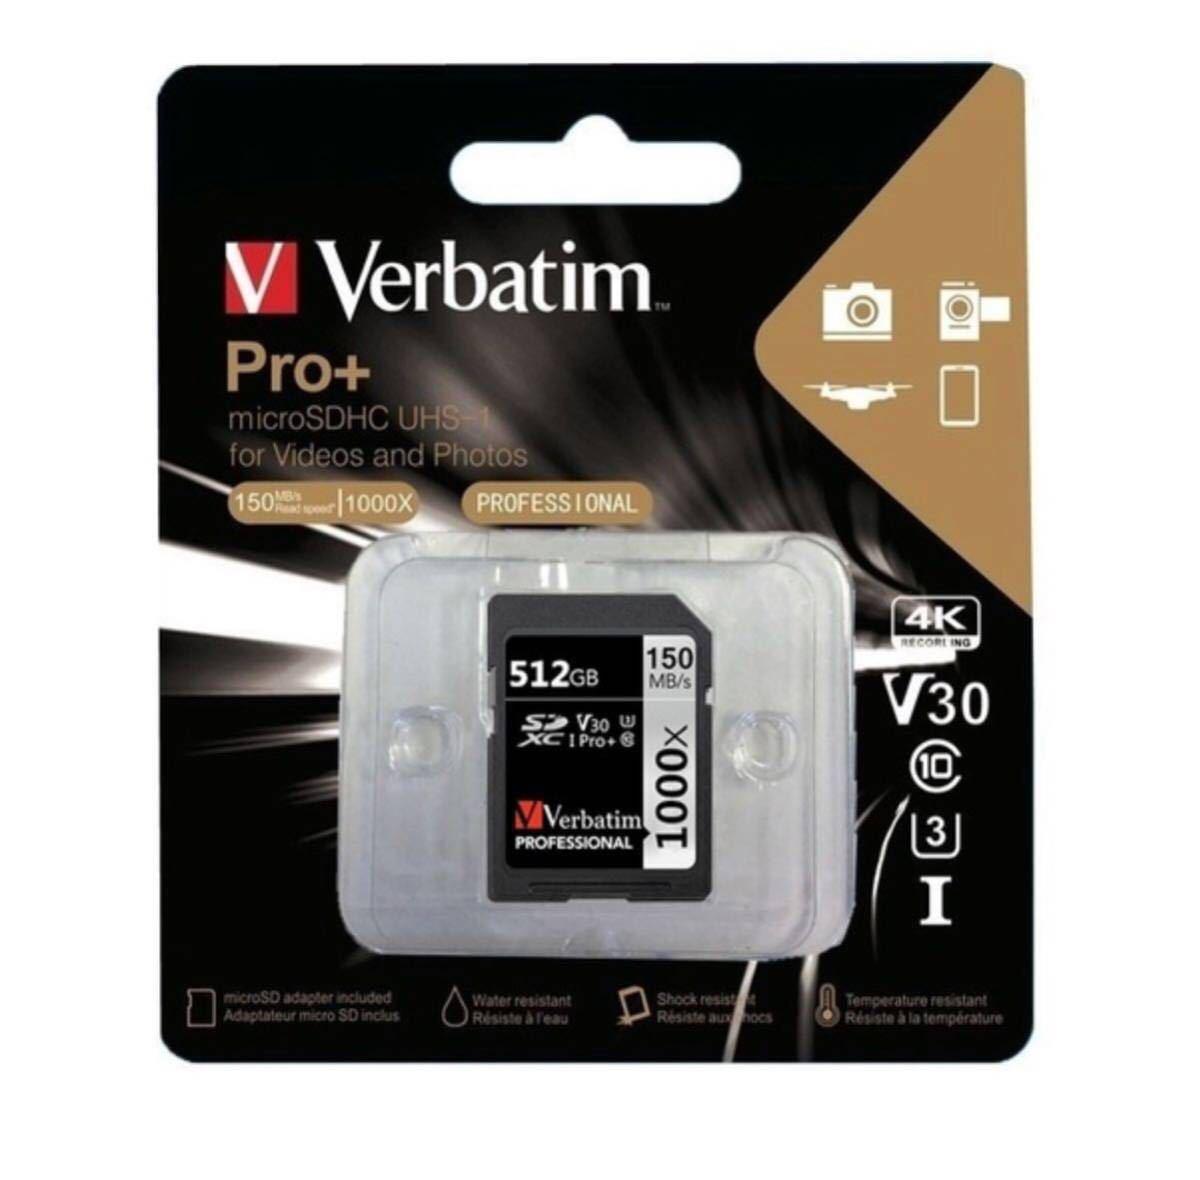 Verbatim 512GB Pro Plus 1000X SDXC Memory Card U3 Class 10 free